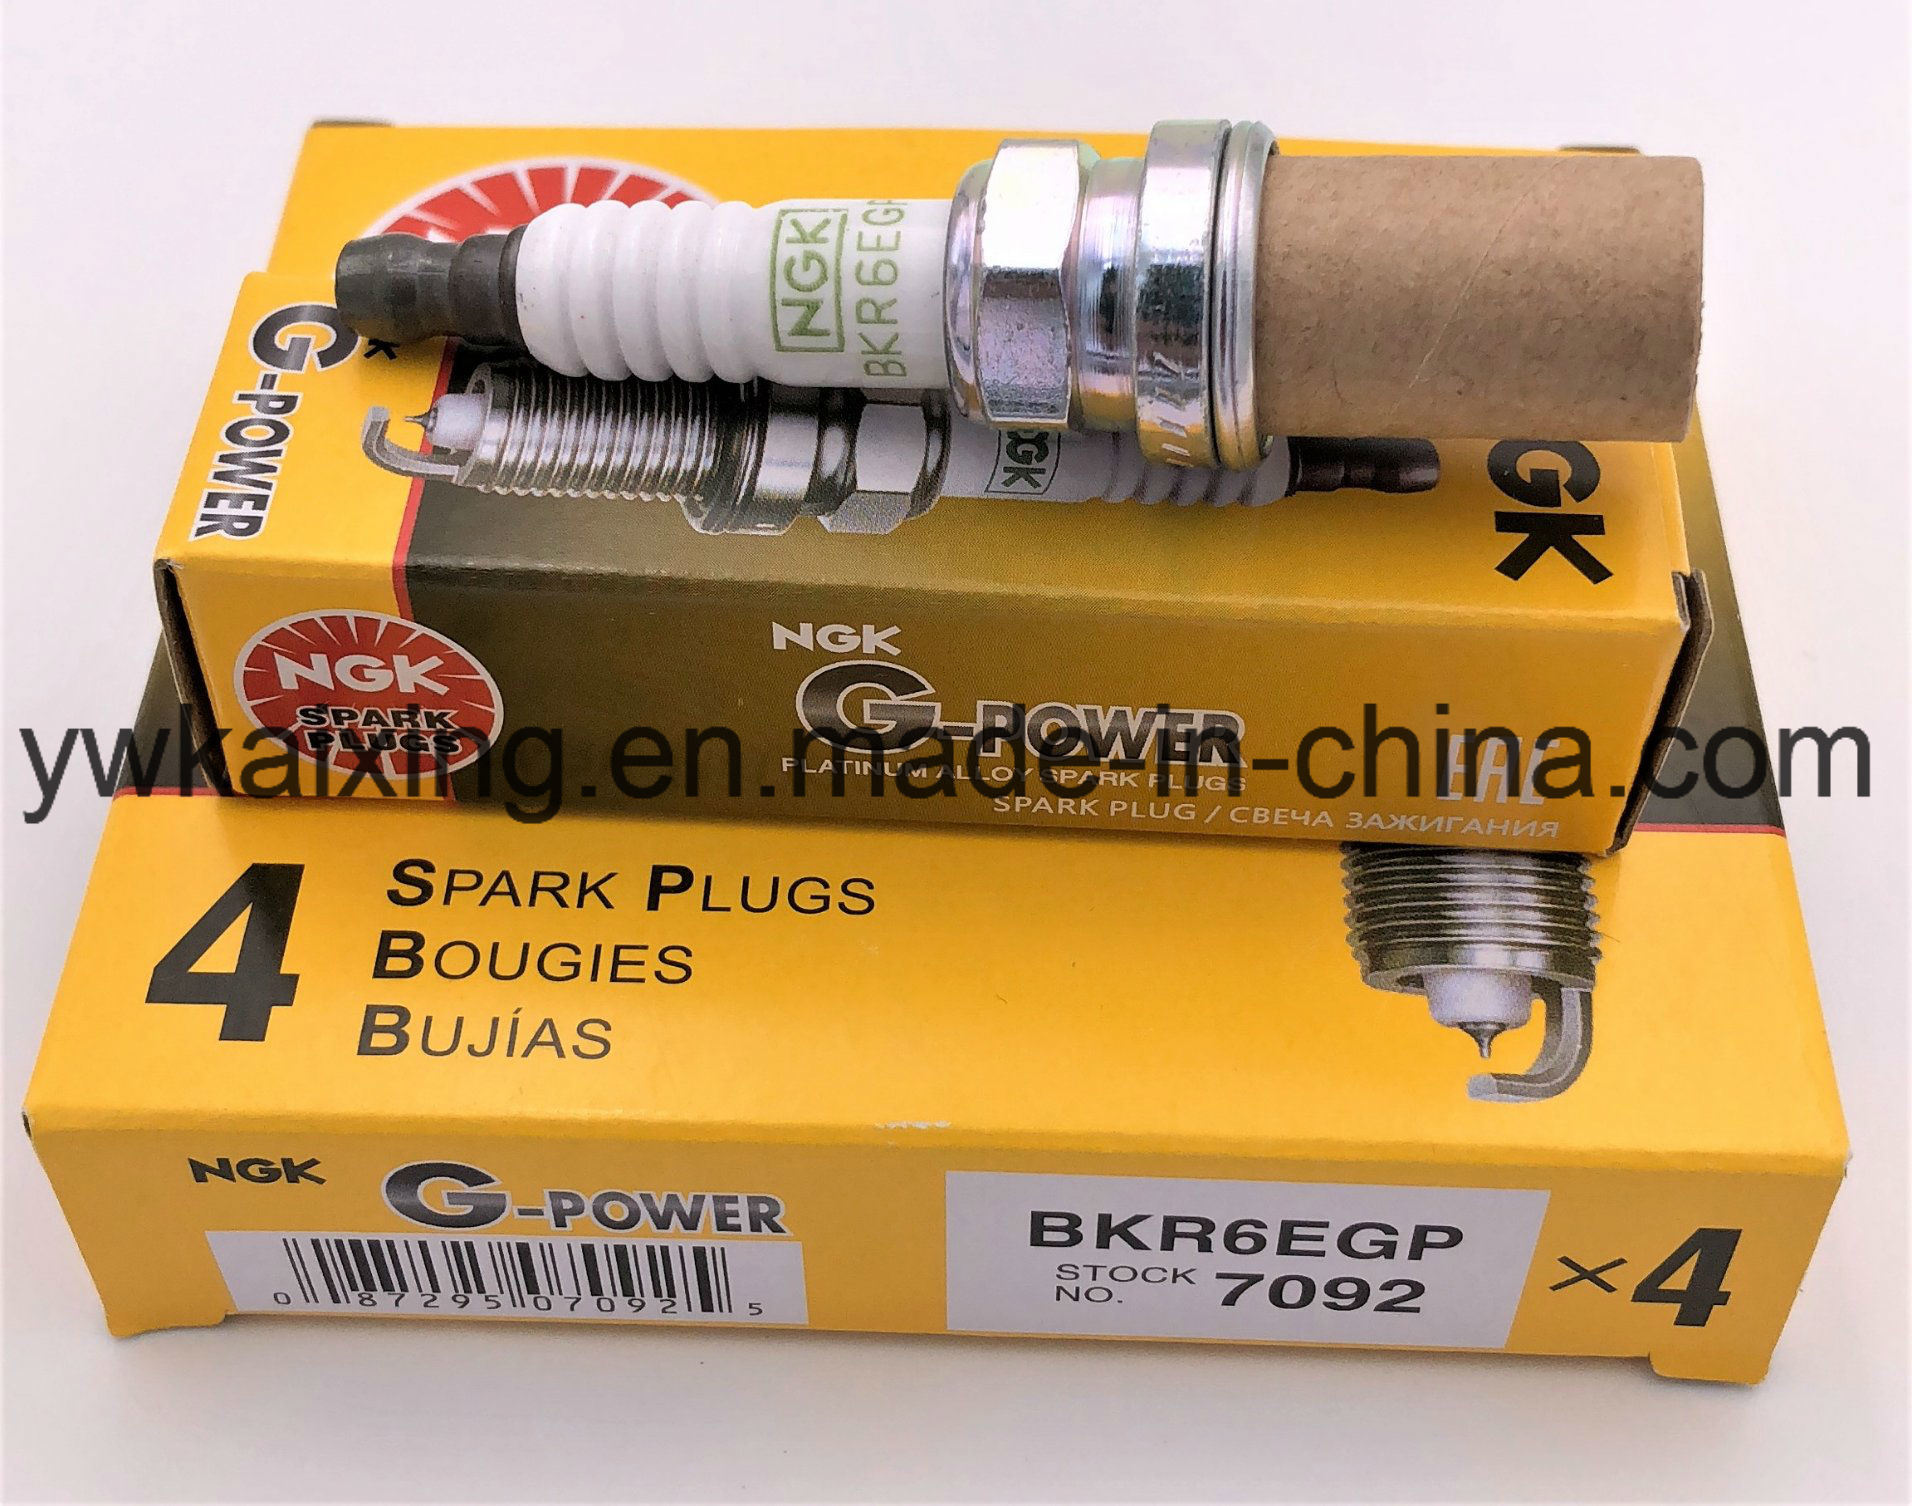 6 pcs NGK Laser Iridium Plug Spark Plugs 2003 Mitsubishi Eclipse Spyder GTS